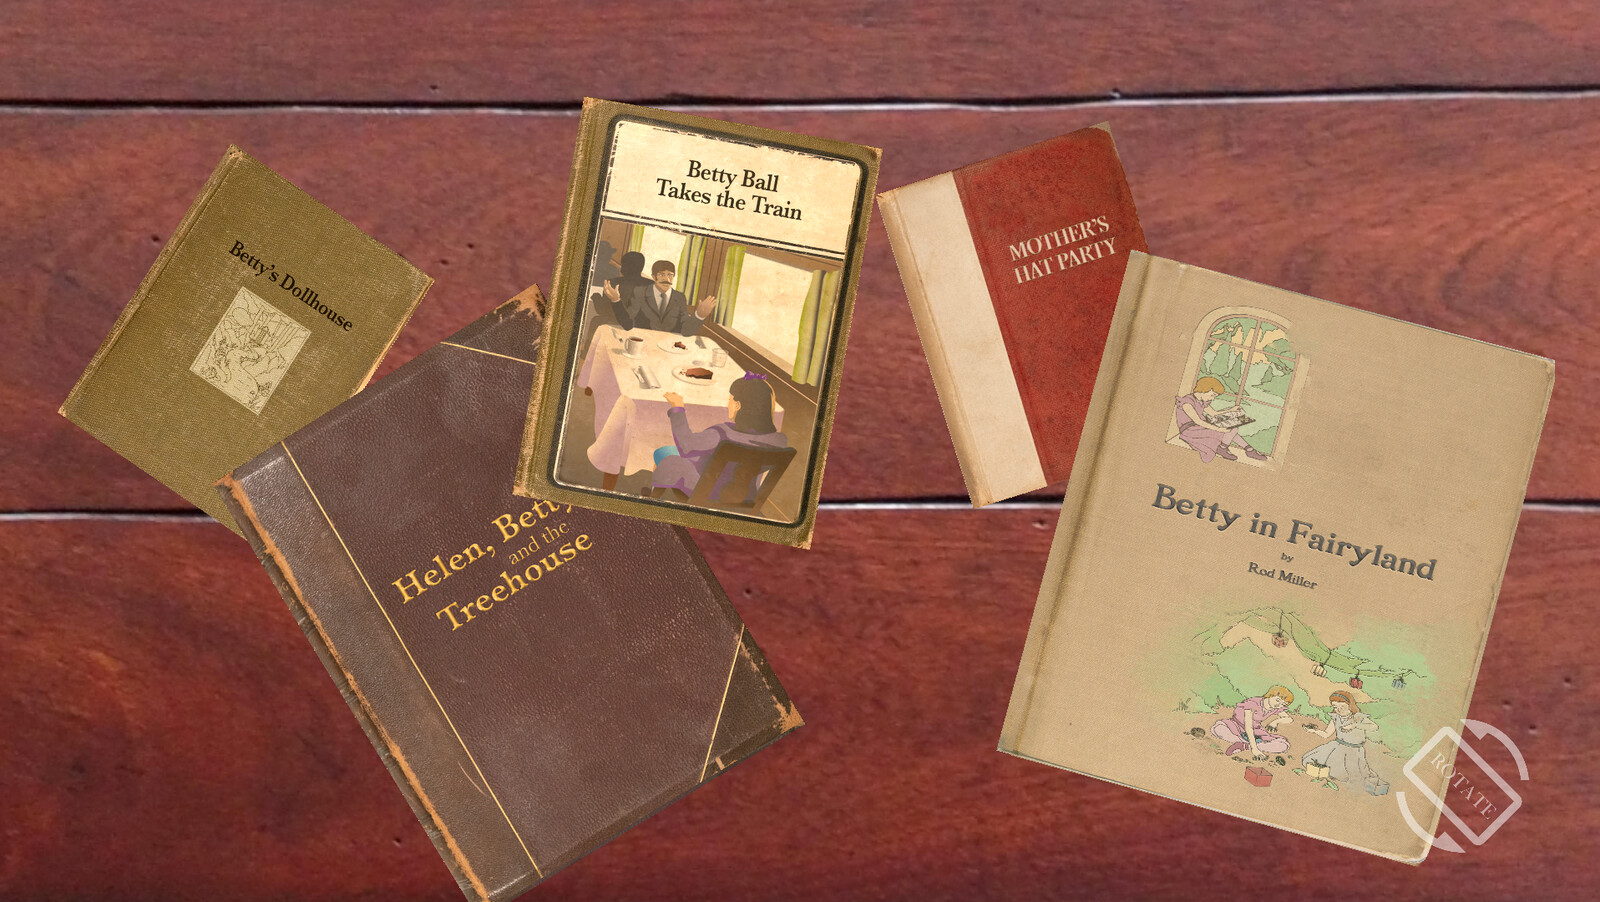 Minnetrista Storybooks